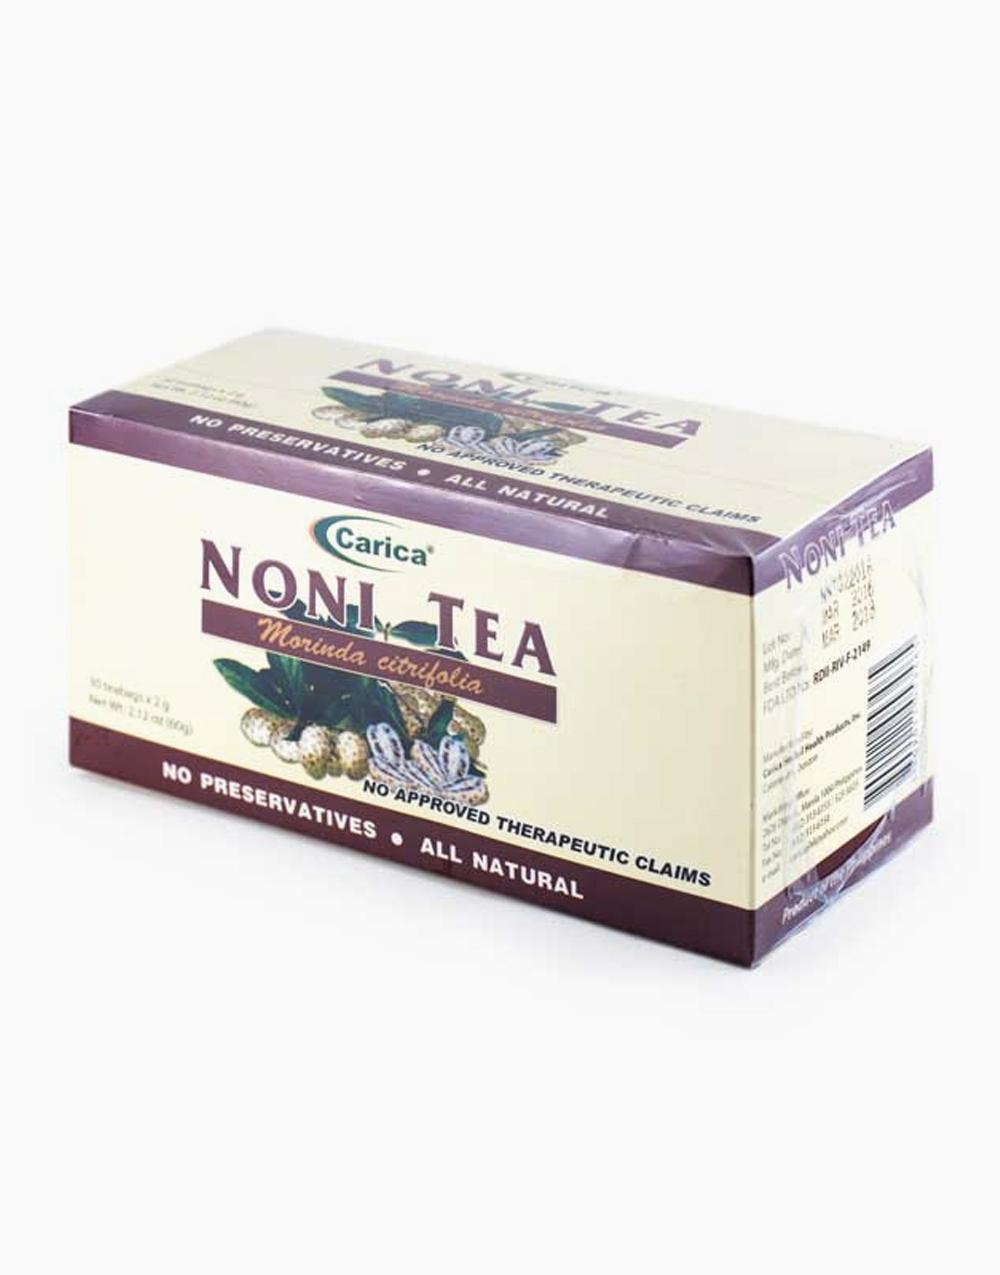 Noni Tea (30 Teabags) by Carica